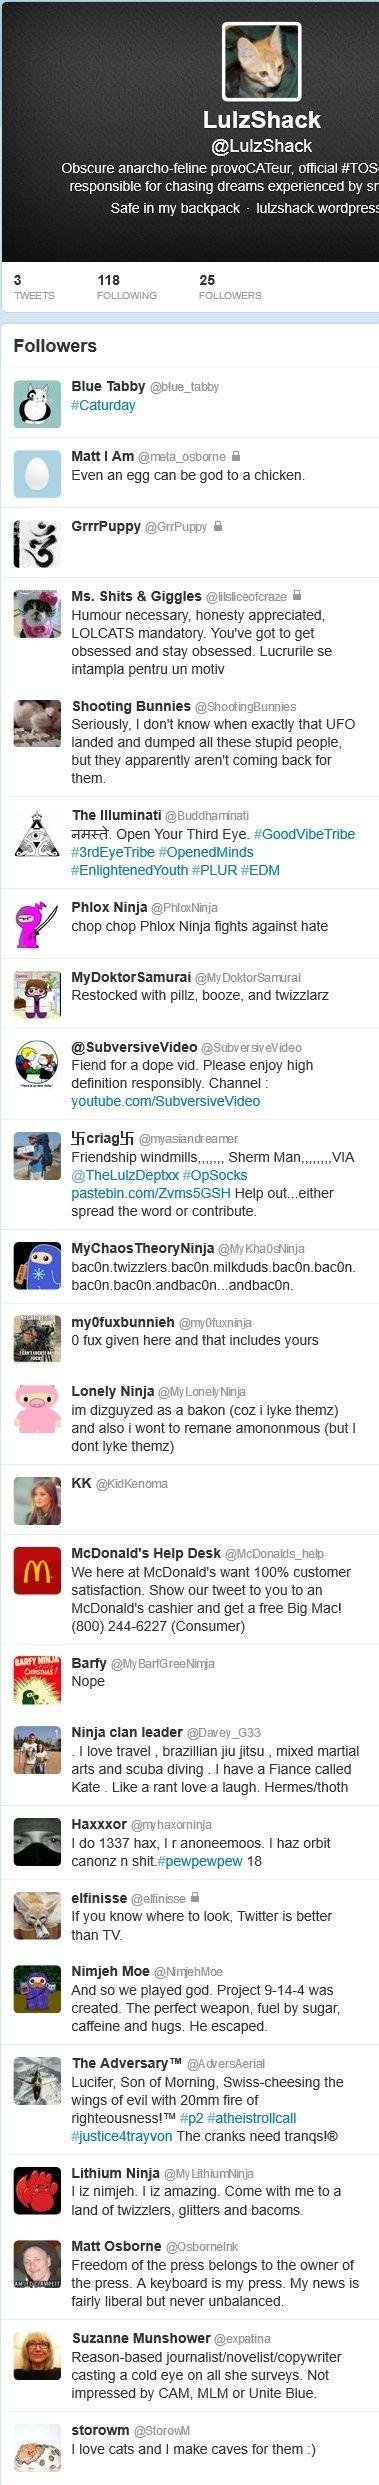 Followers of an Alternate Neal Sock Account 1139_s10